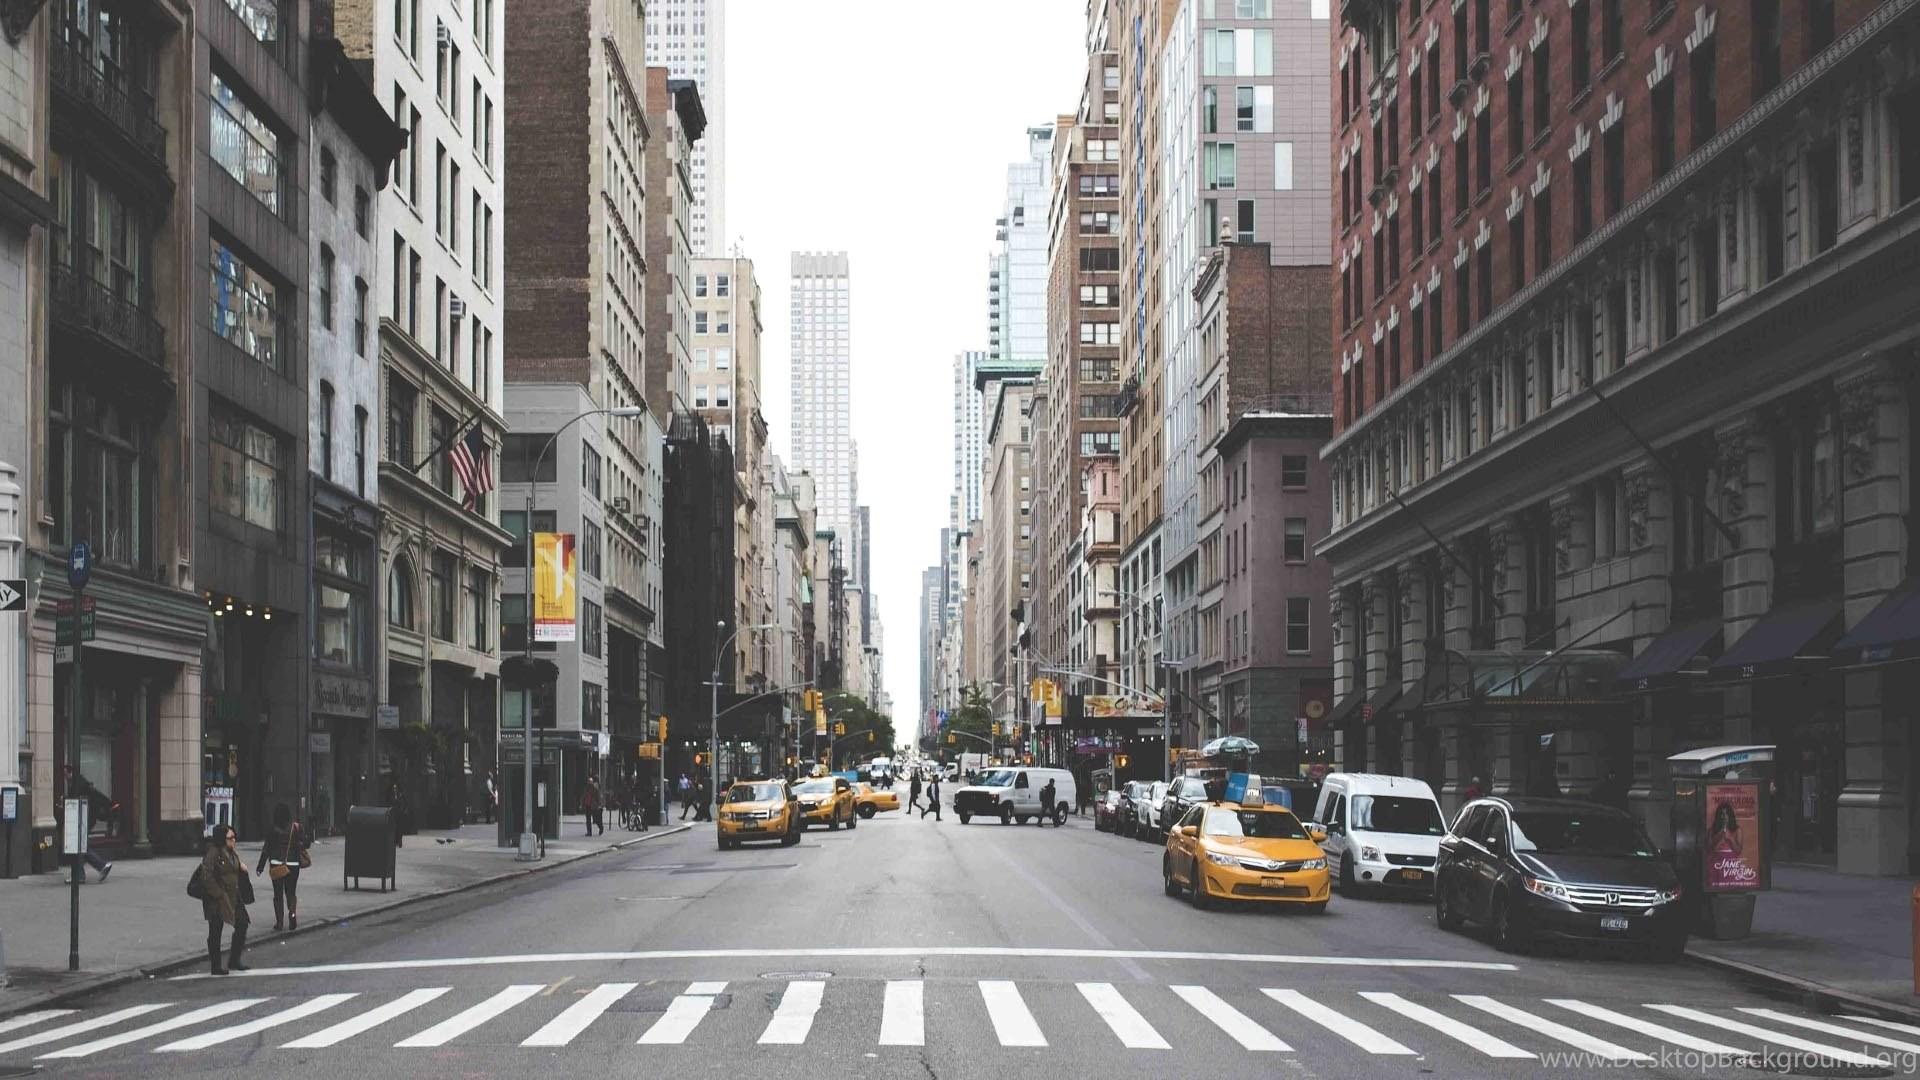 Day Vintage New York Street Photo Wallpapers HD Desktop Background